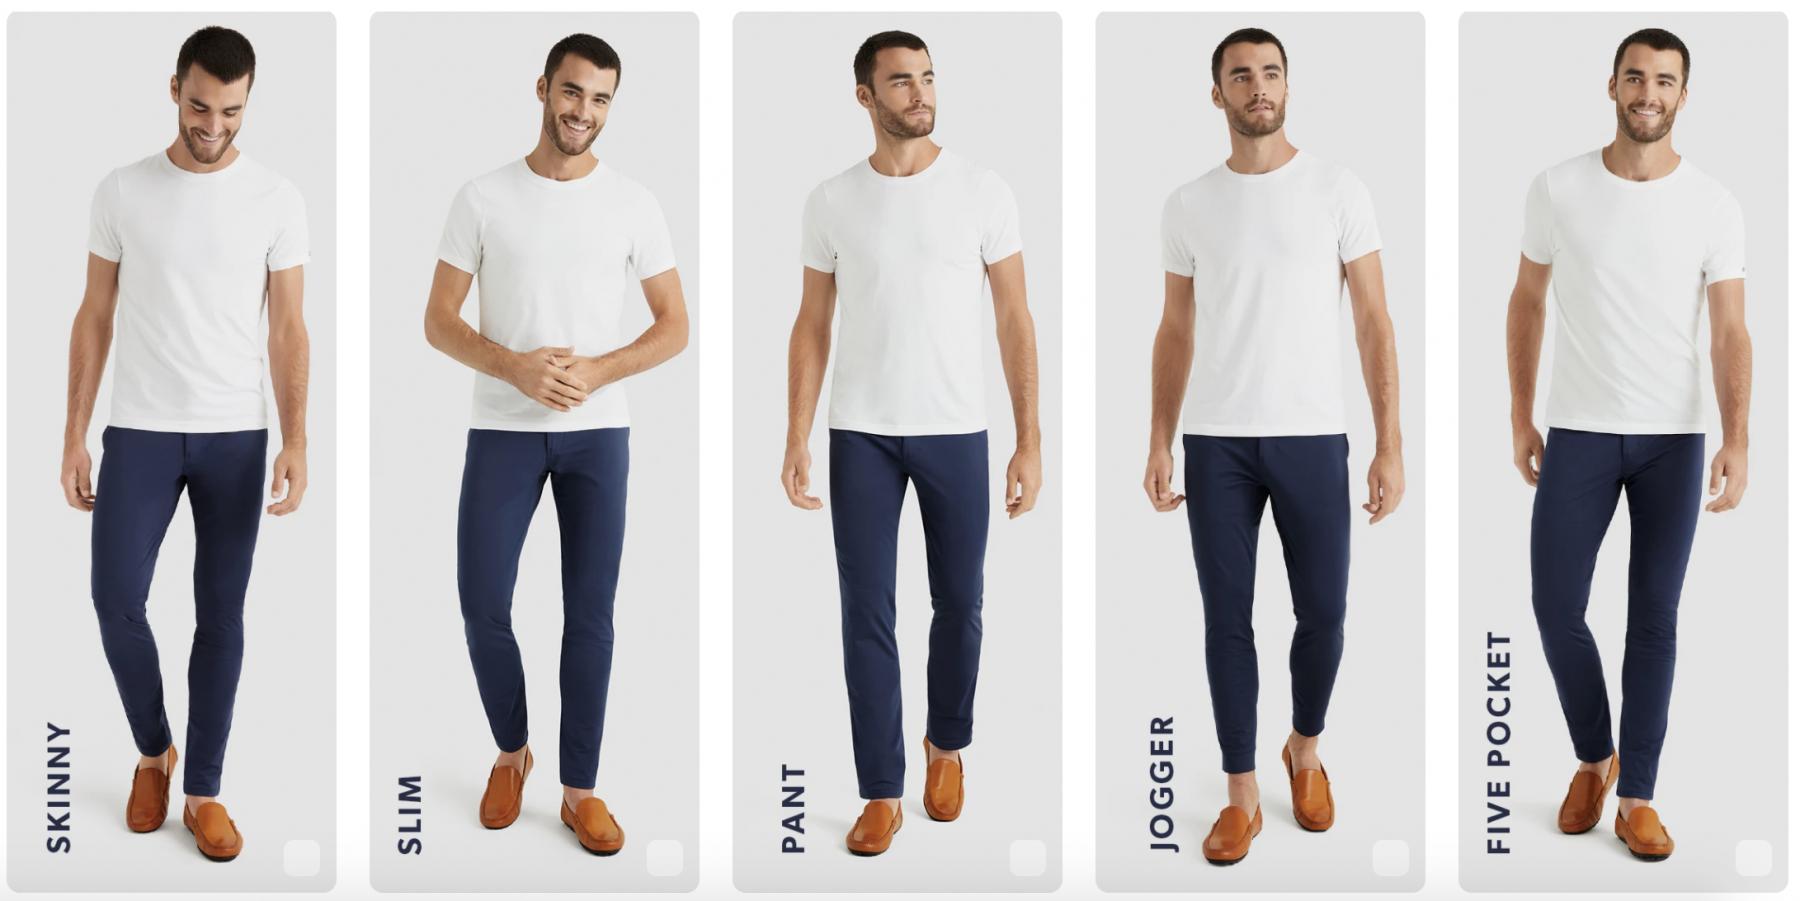 Rhone commuter pant styles